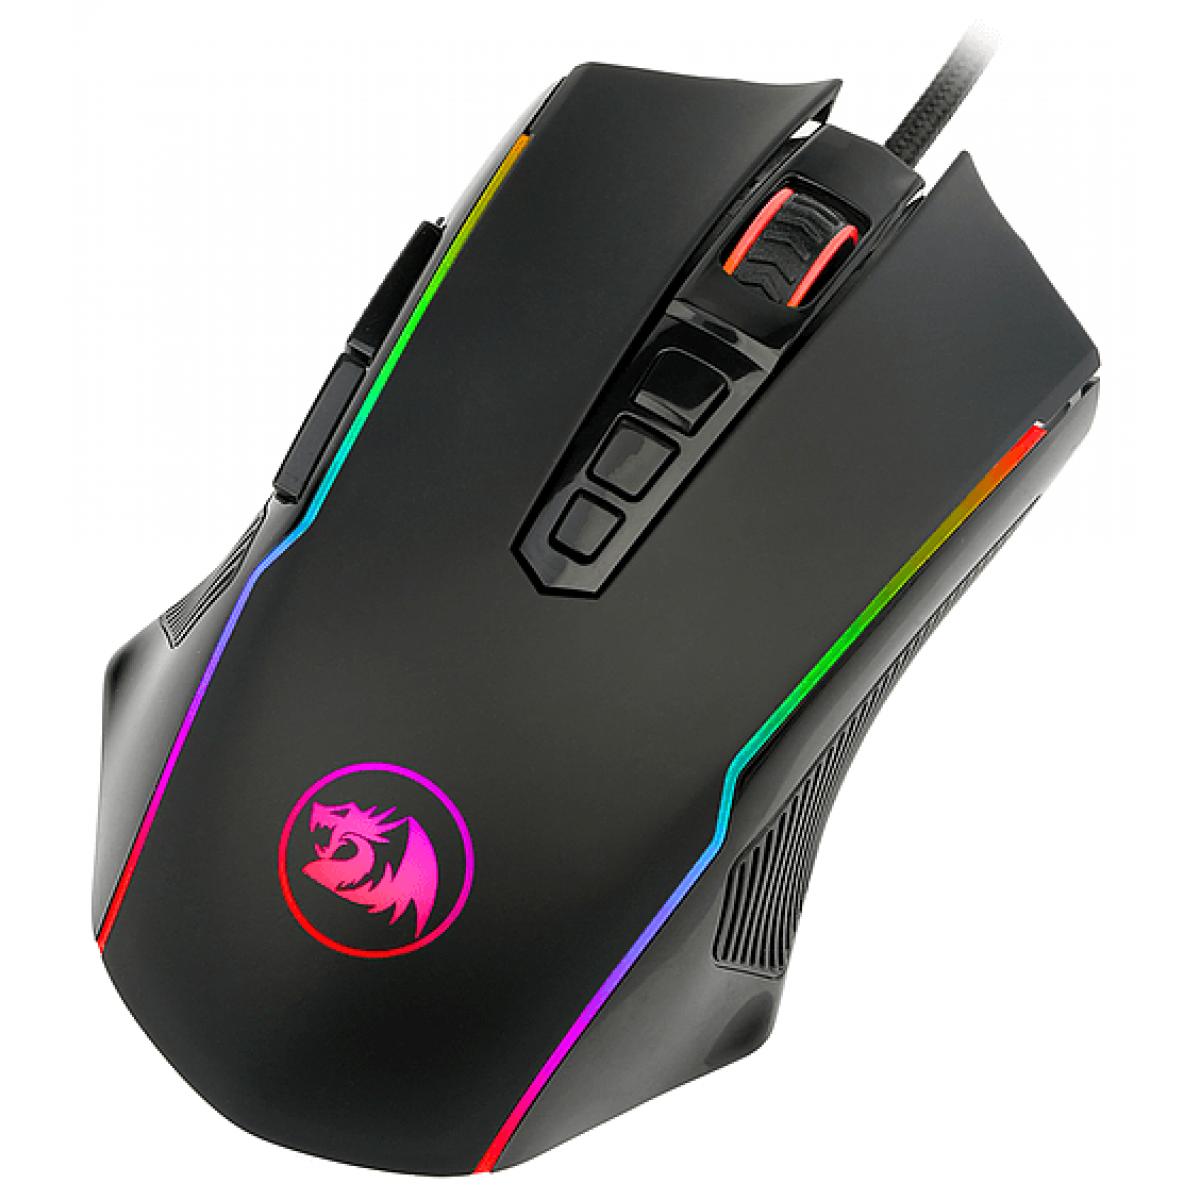 Mouse Gamer Redragon Ranger M910 RGB, 12400 DPI, 9 Botões Programáveis, Black